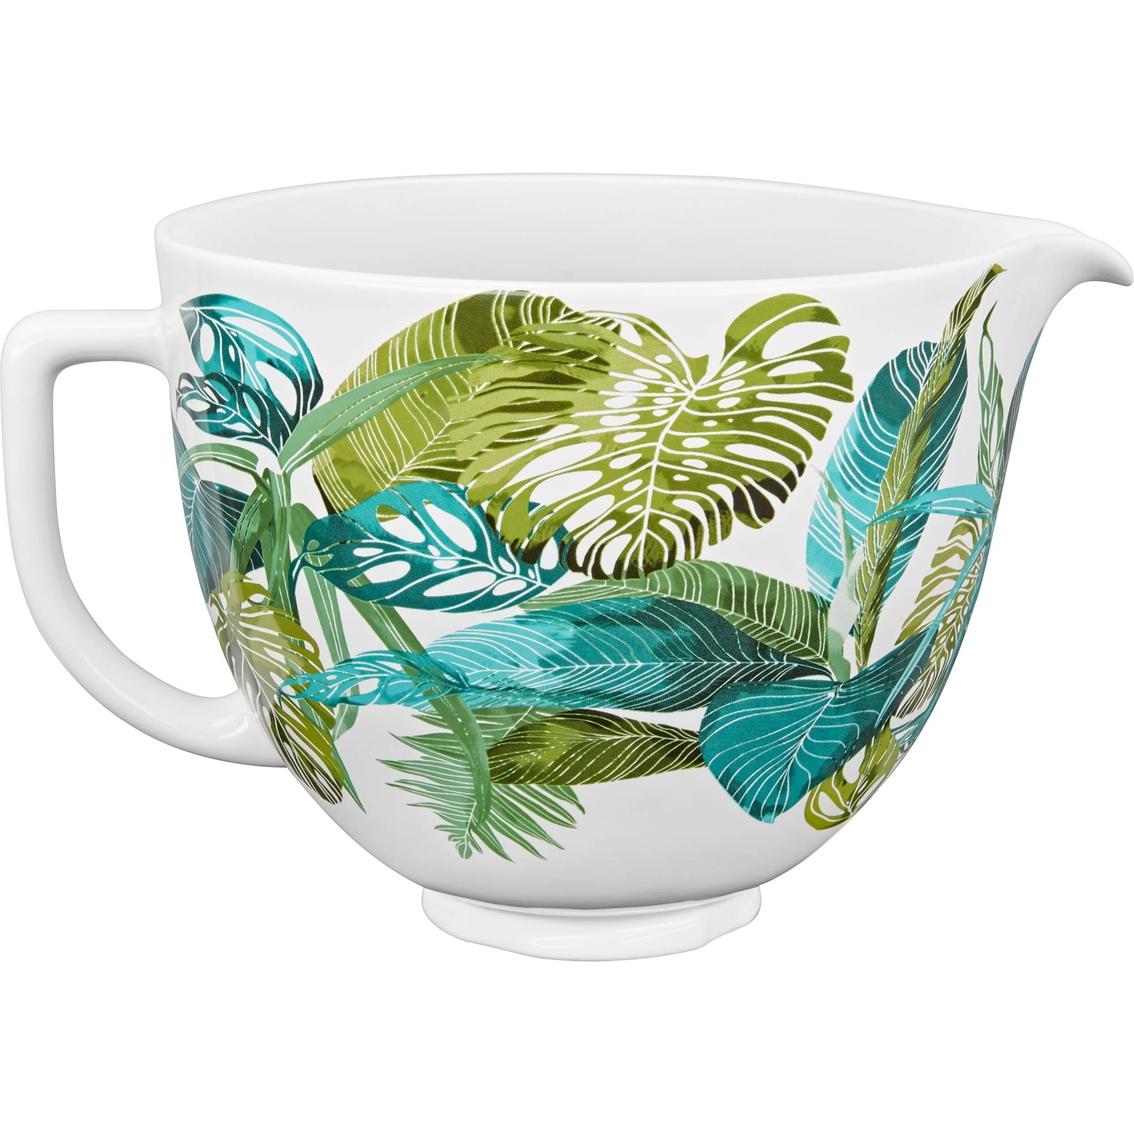 Kitchenaid 5 Quart Tropical Floral Ceramic Bowl Wow Gifts Shop The Exchange